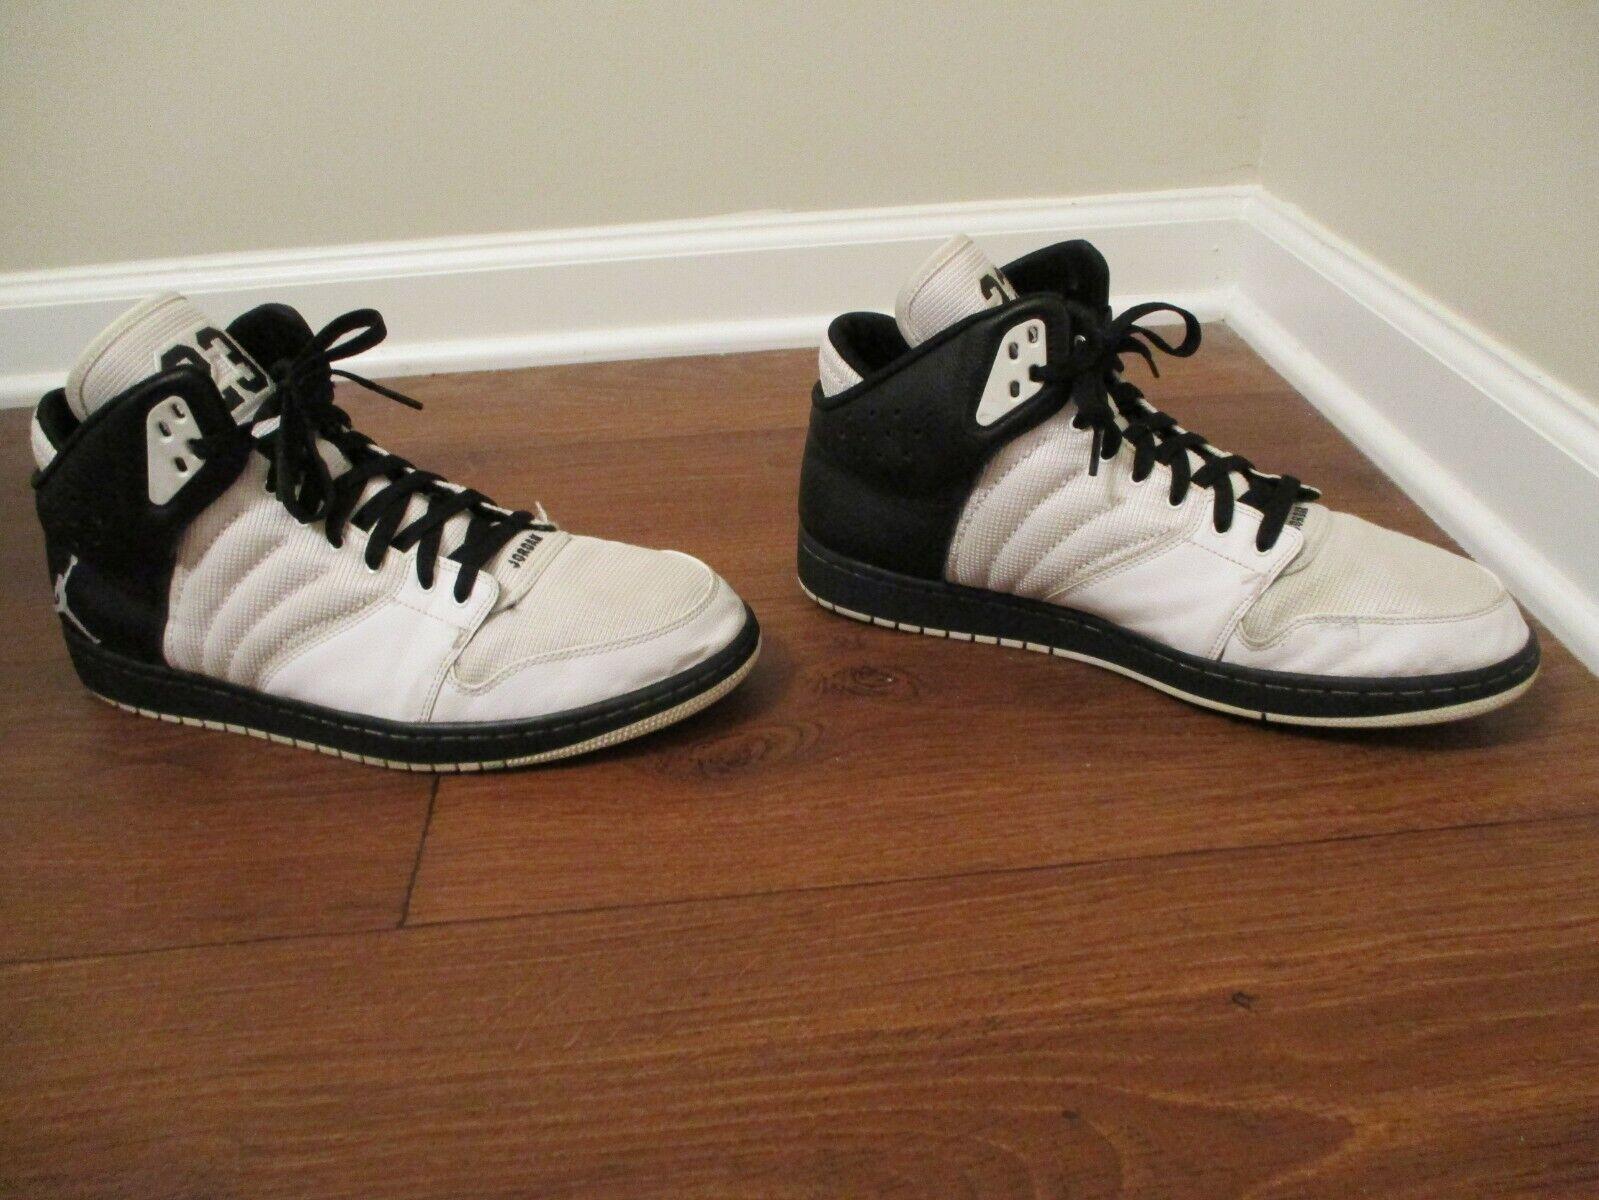 Used Worn Size 13 Nike Jordan 1 Flight 4 shoes White Black